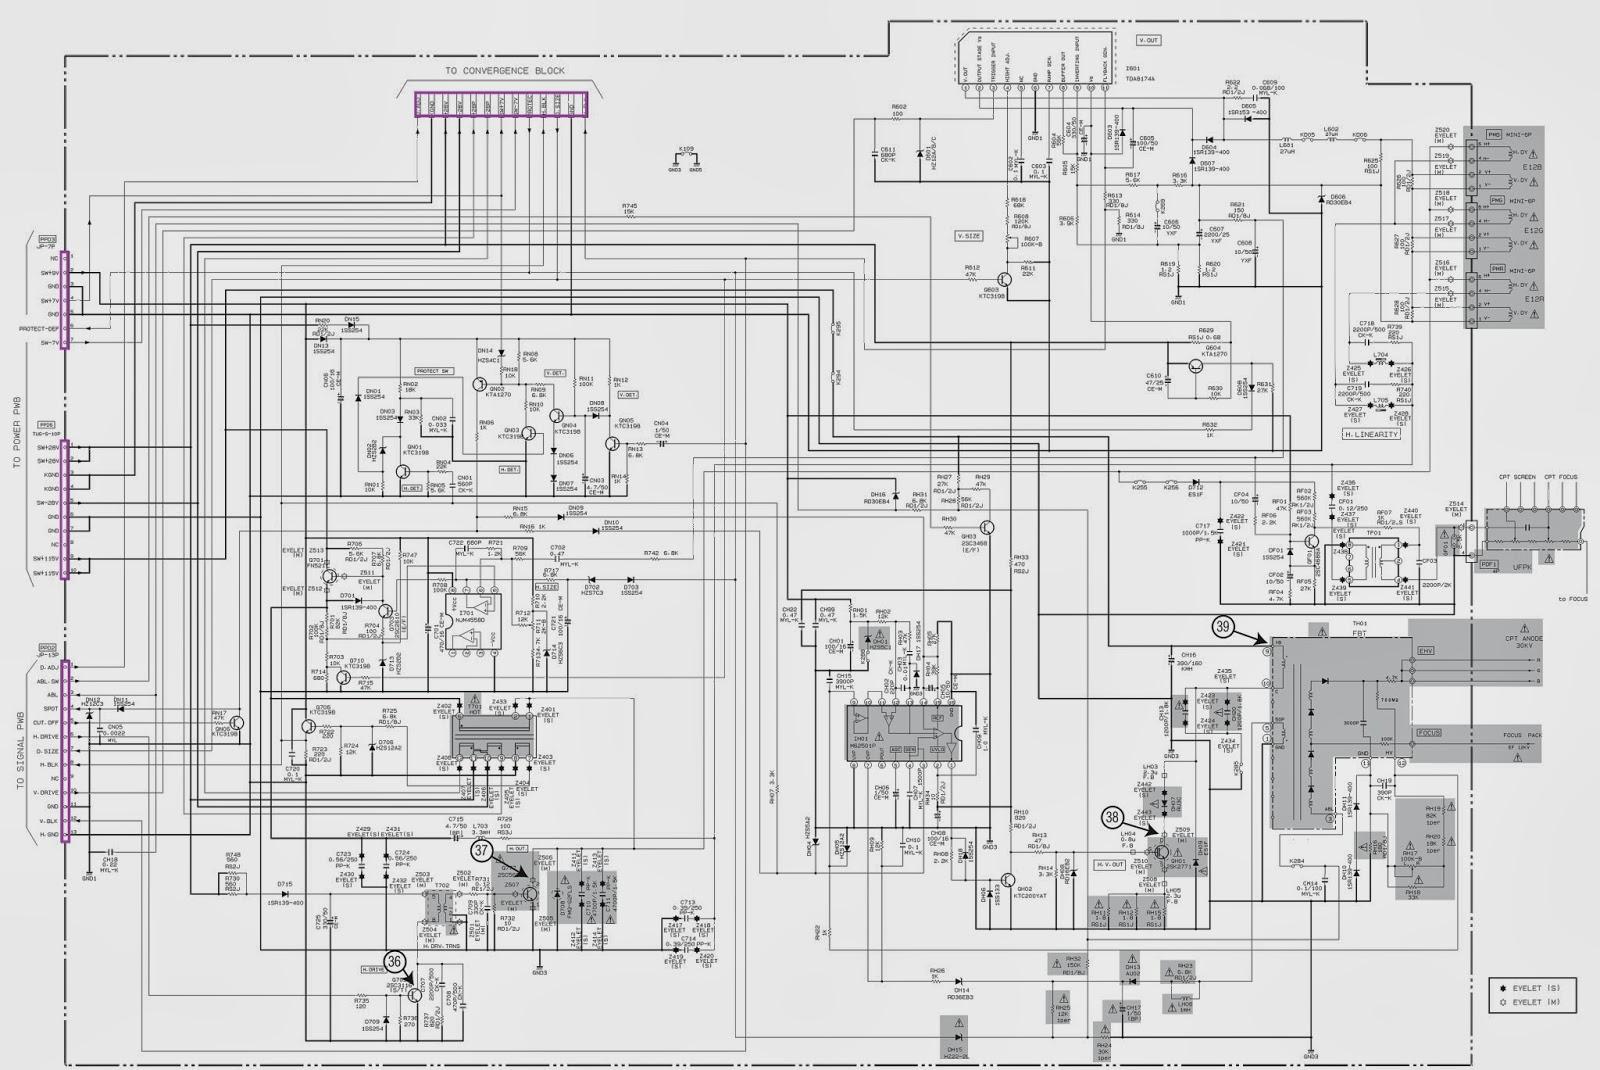 deflection schematic  circuit diagram   hitachi ptv  51    57